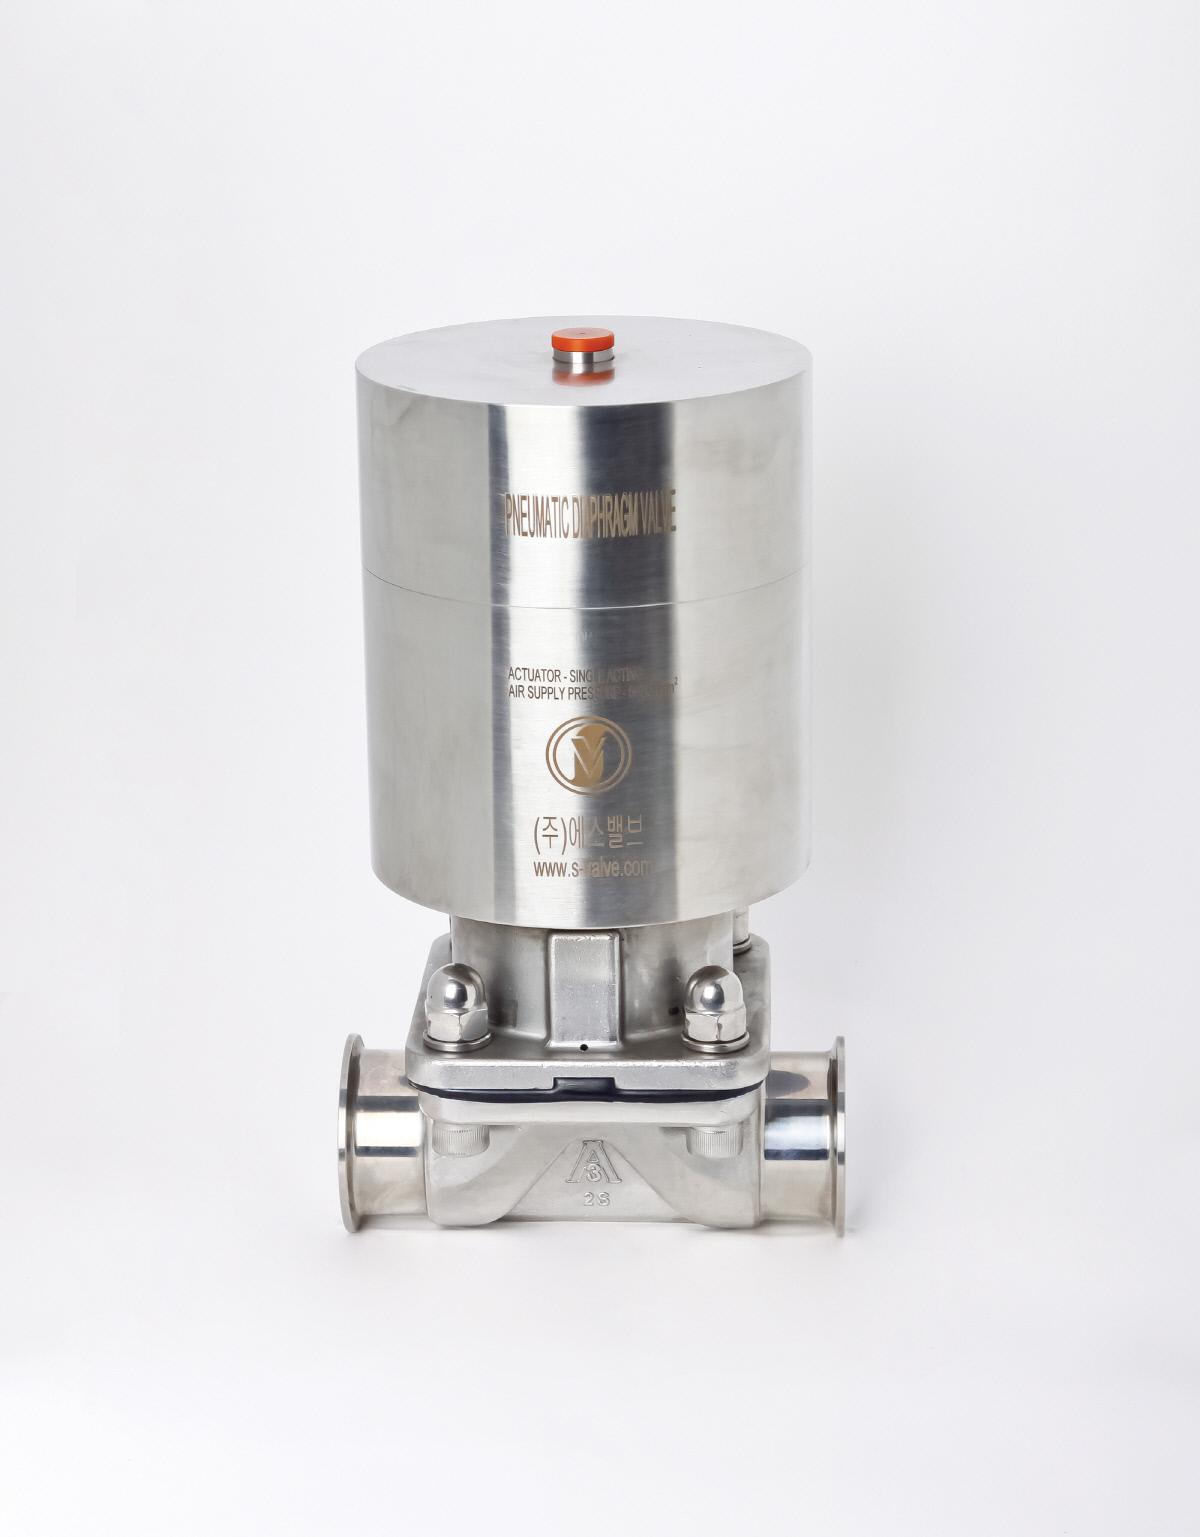 S-valve_0021.jpg